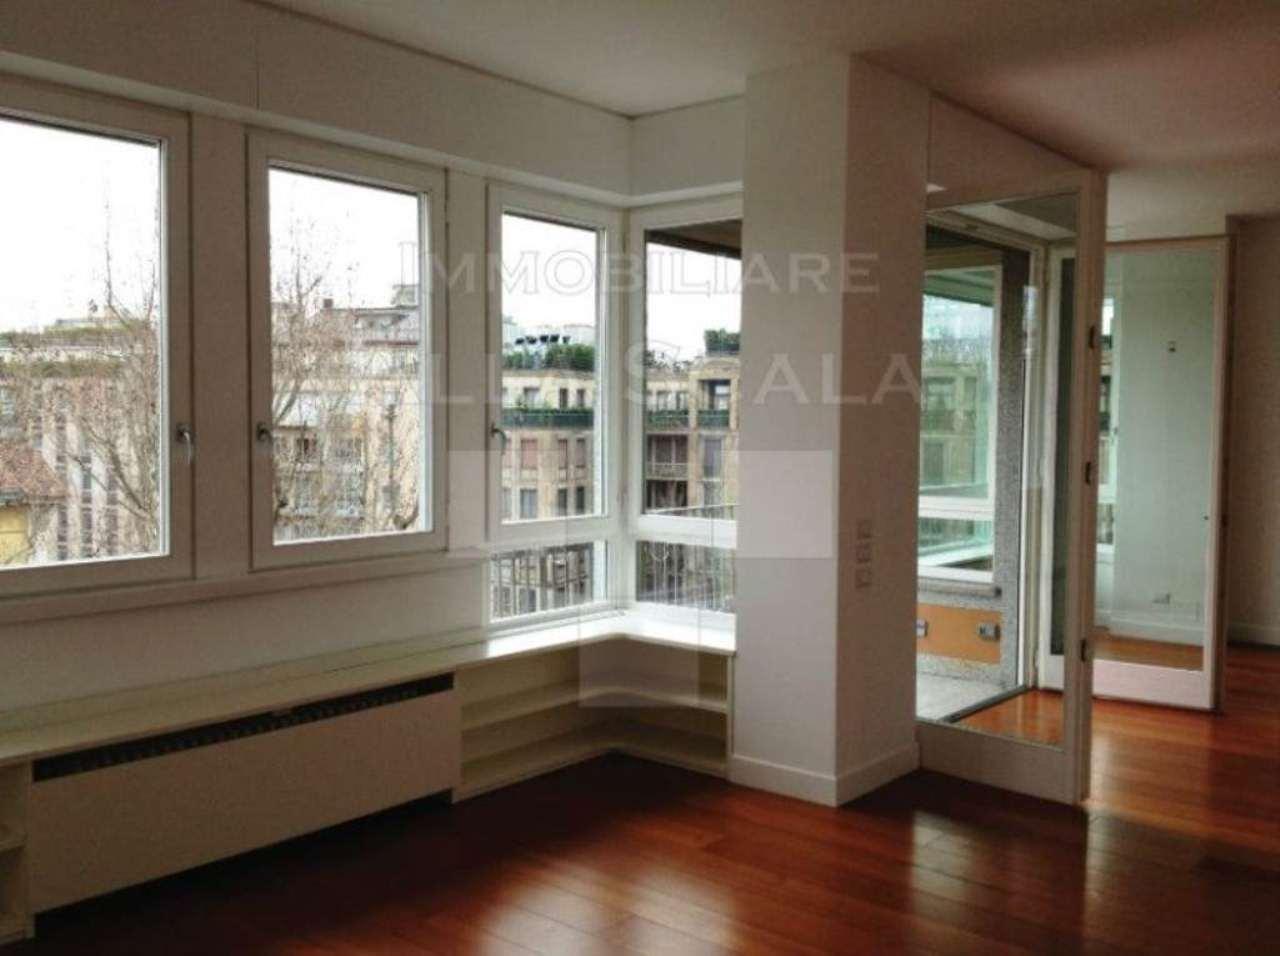 Appartamenti In Vendita A Palermo Da Privati